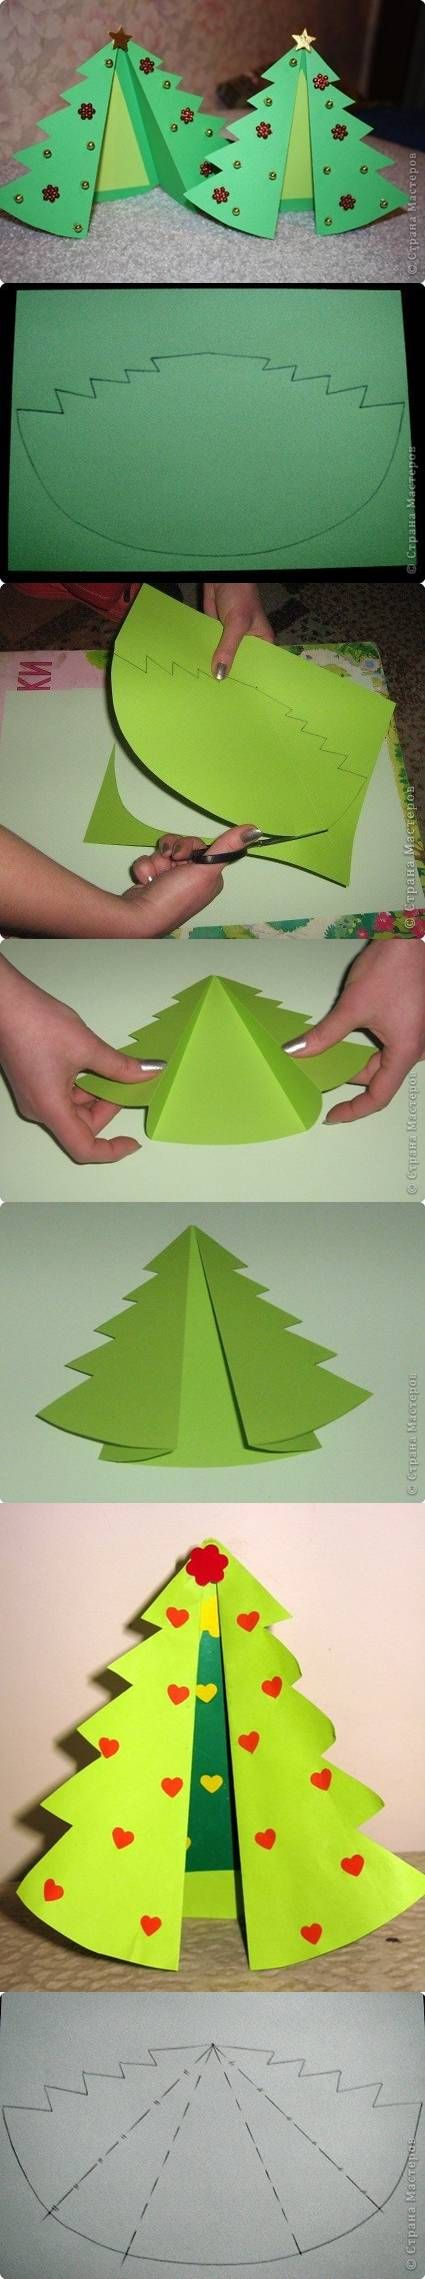 diy-tree-style-card